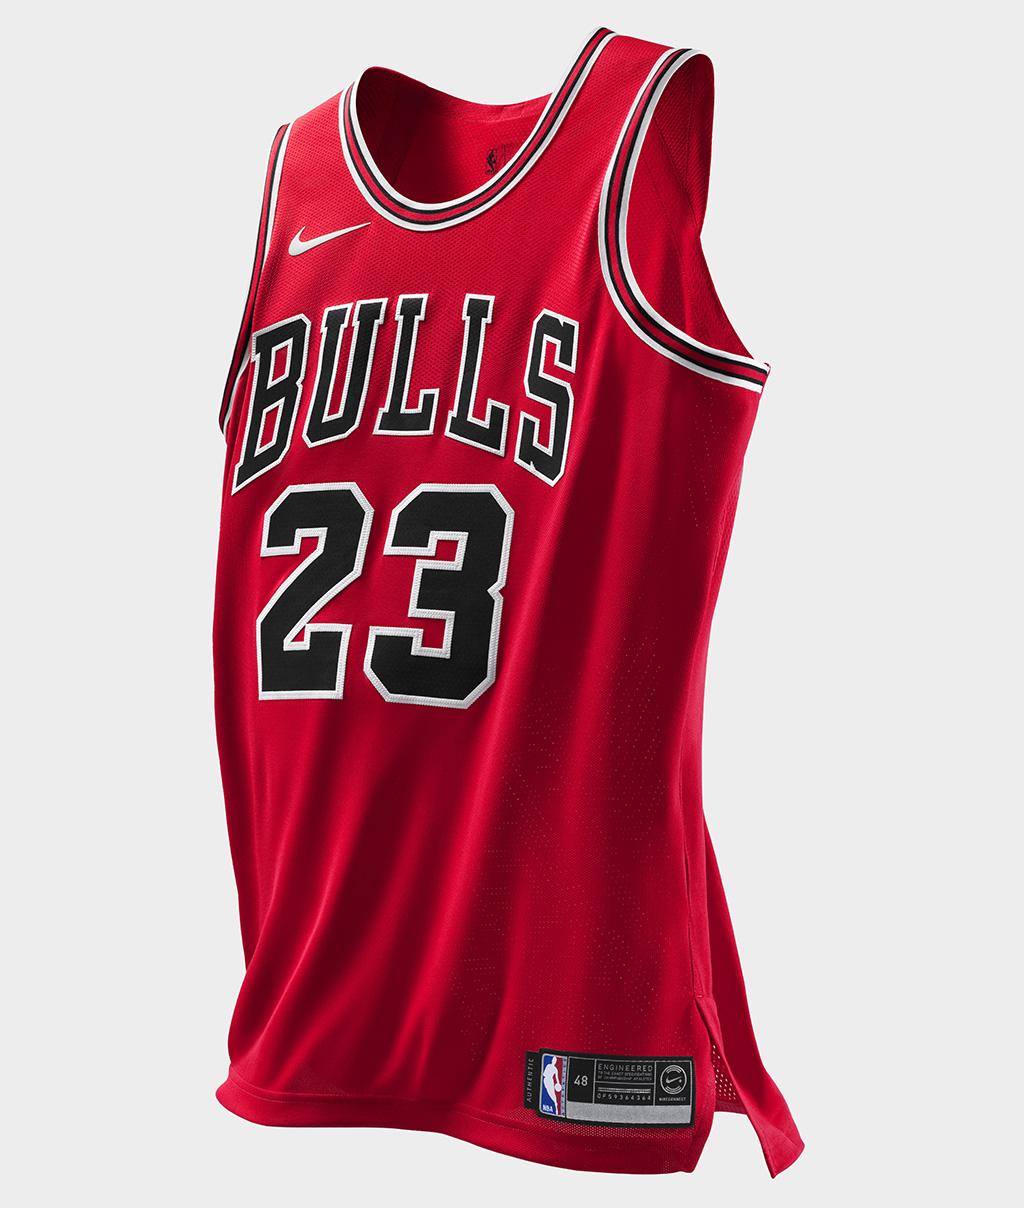 Michael Jordan Authentic Bulls Jersey by Nike